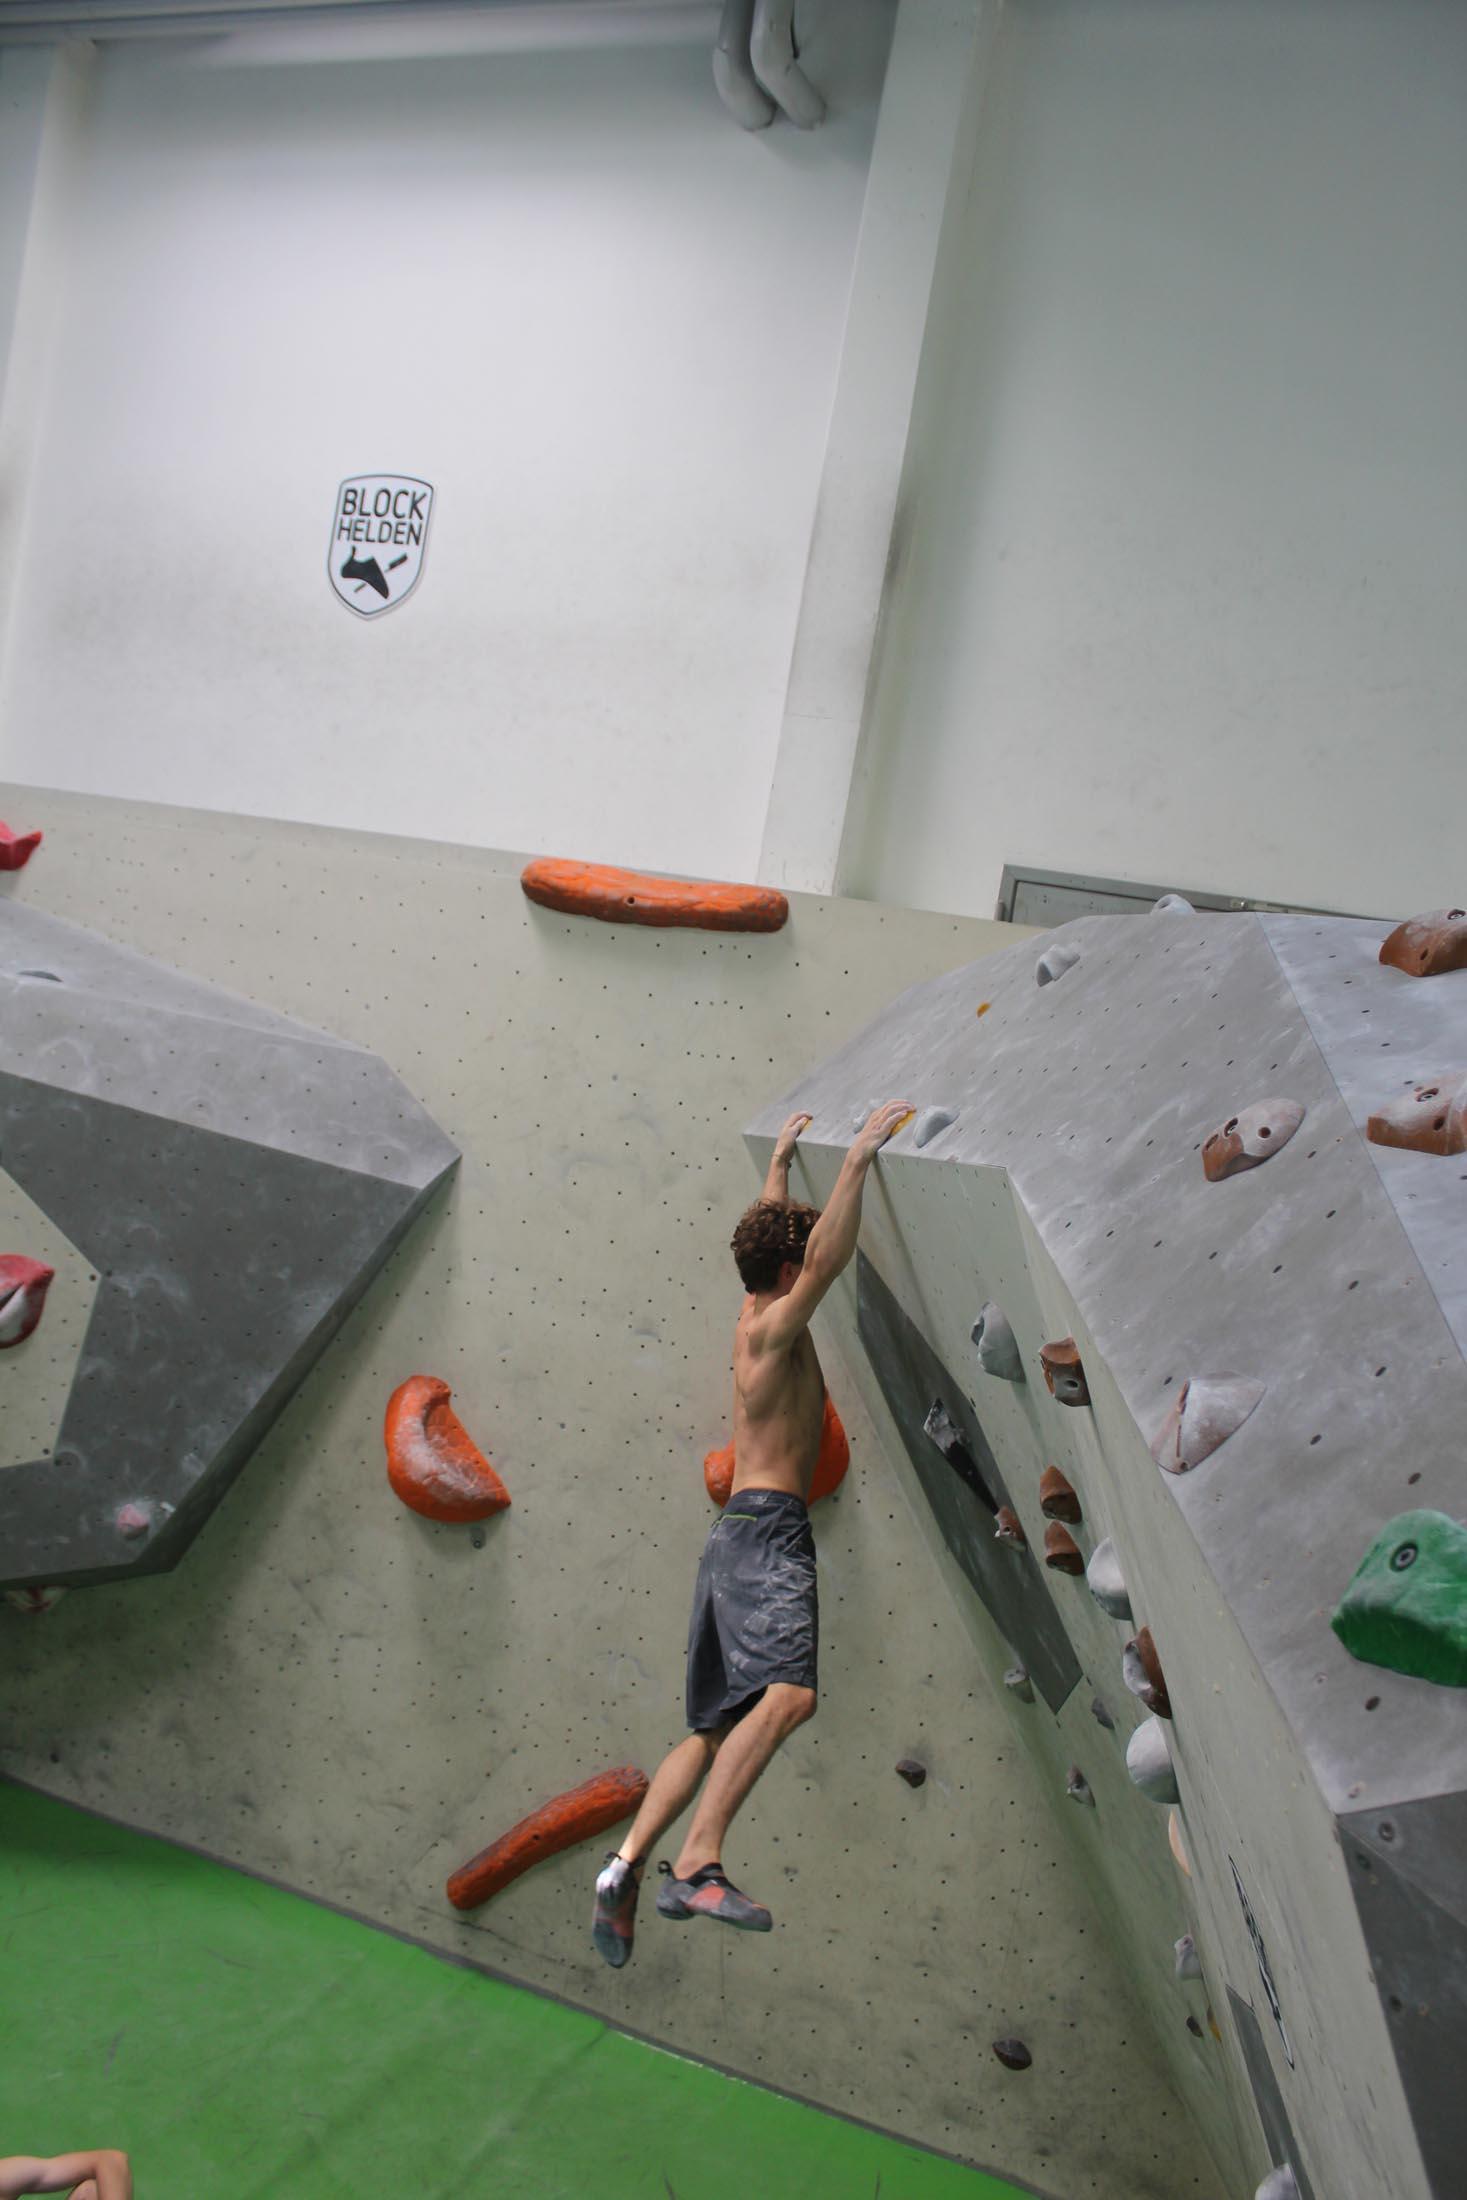 Quali, internationaler bouldercup Frankenjura 2016, BLOCKHELDEN Erlangen, Mammut, Bergfreunde.de, Boulderwettkampf07092016220